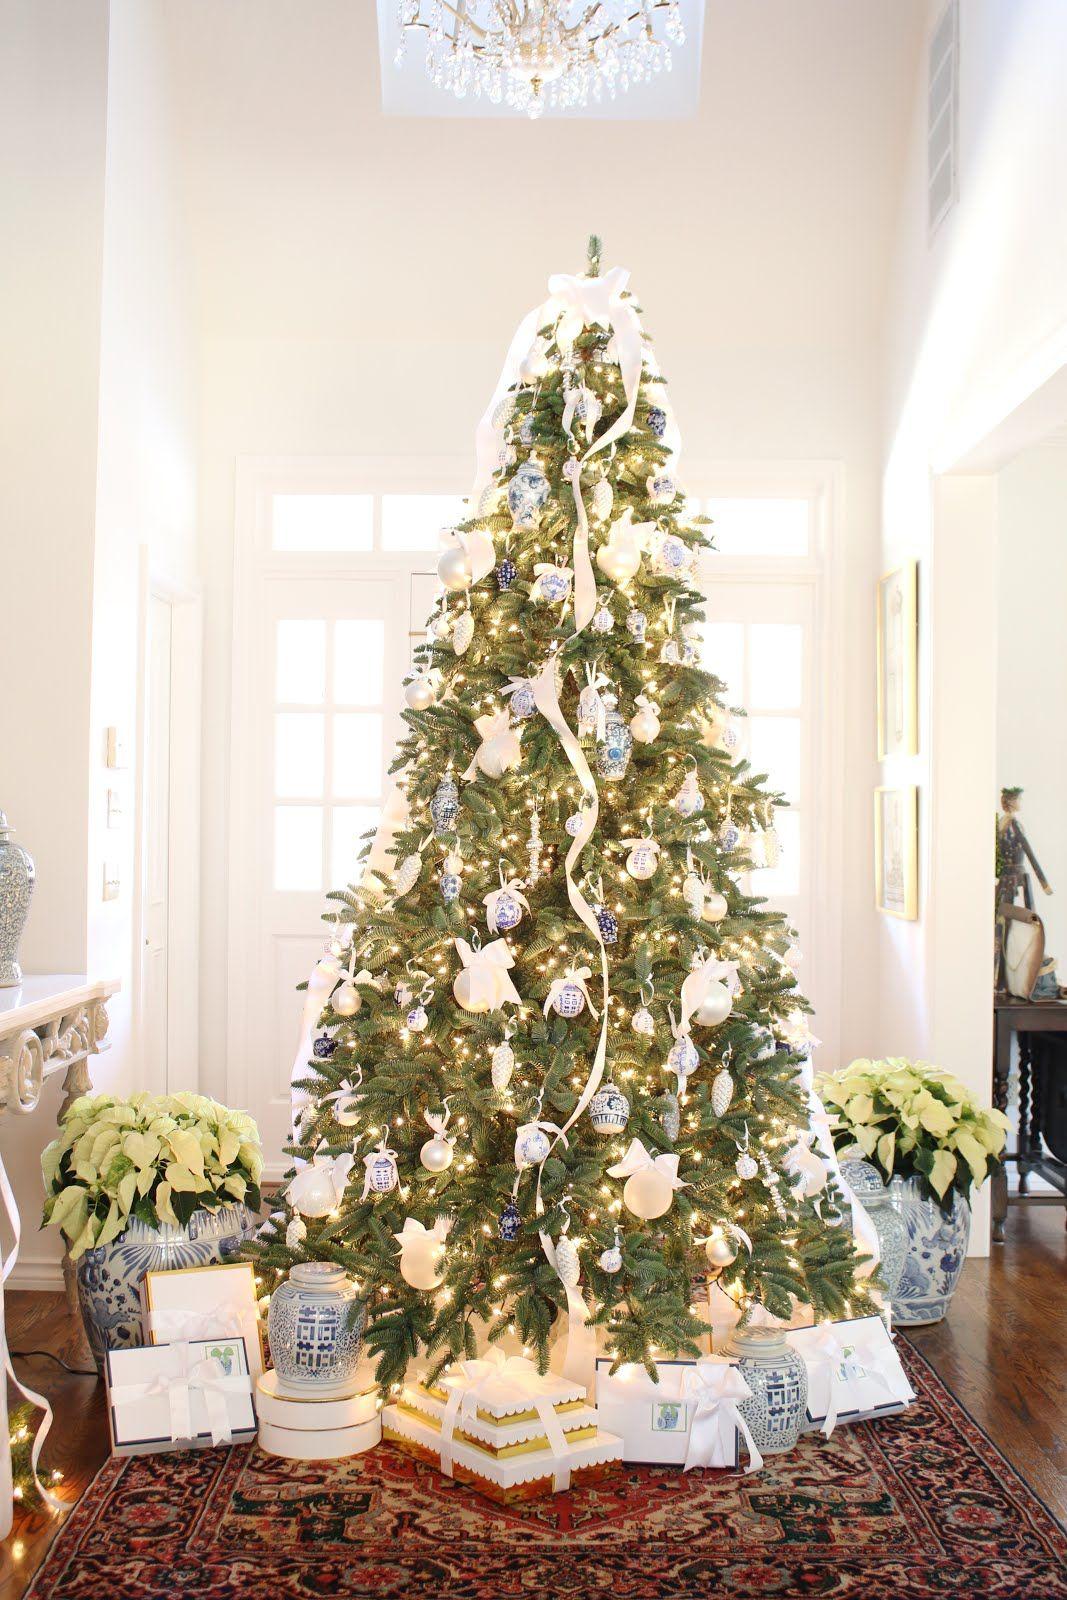 Albero Di Natale Yule.3 Bp Blogspot Com Ukl Febc Lw Wecapeityhi Aaaaaaaaee8 2abfadxm3m4pwck4wy5ege3jenzat3nogck4b Blue Christmas Christmas Tree Themes Christmas Crafts Decorations